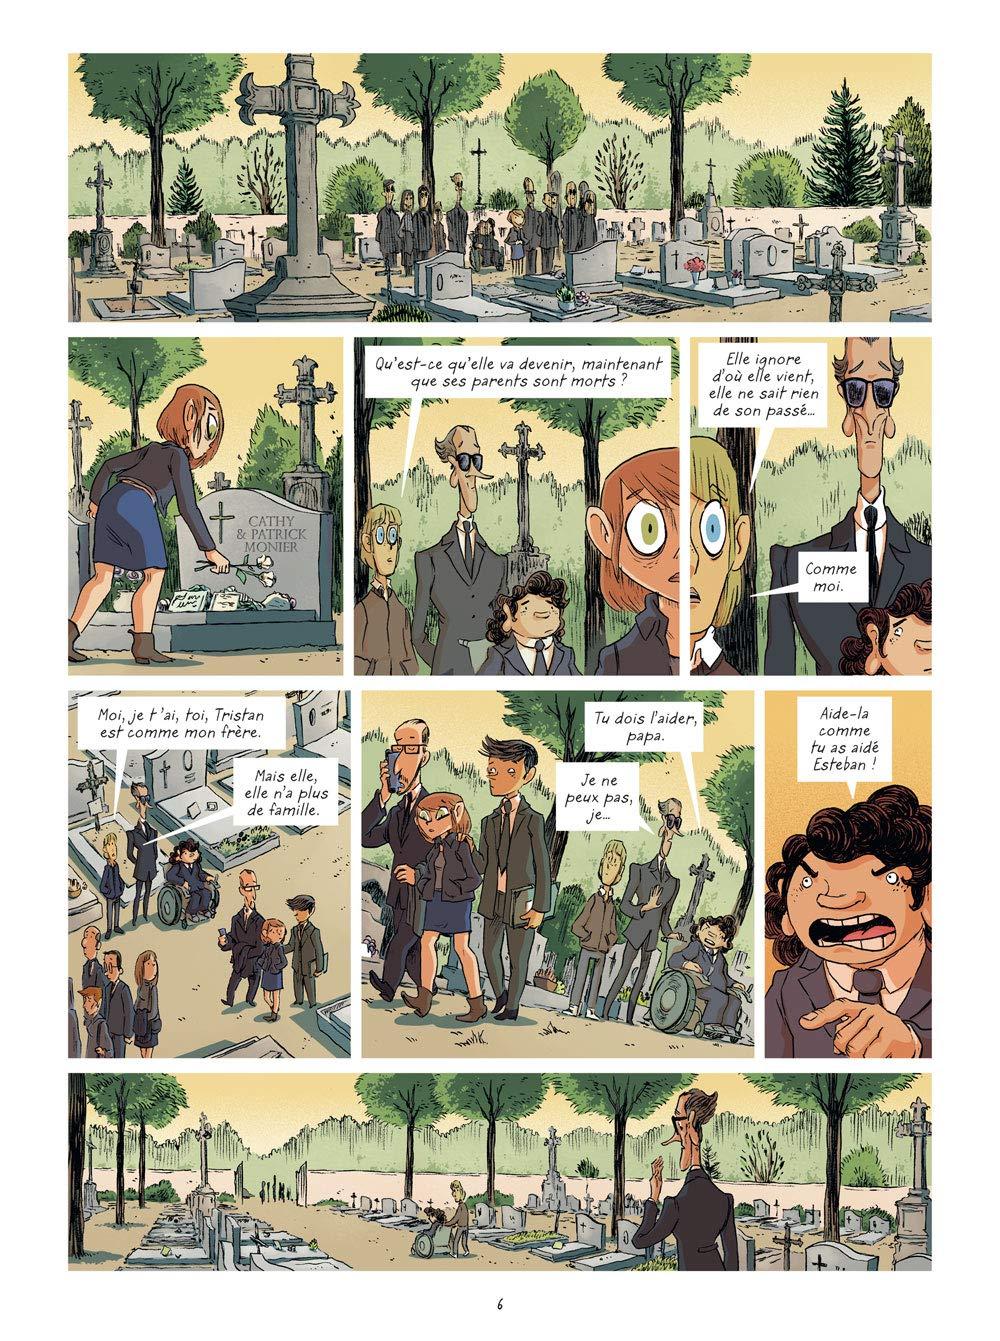 Franck THILLIEZ et YOMGUI DUMONT - La brigade des cauchemars - tome 2 - Nicolas